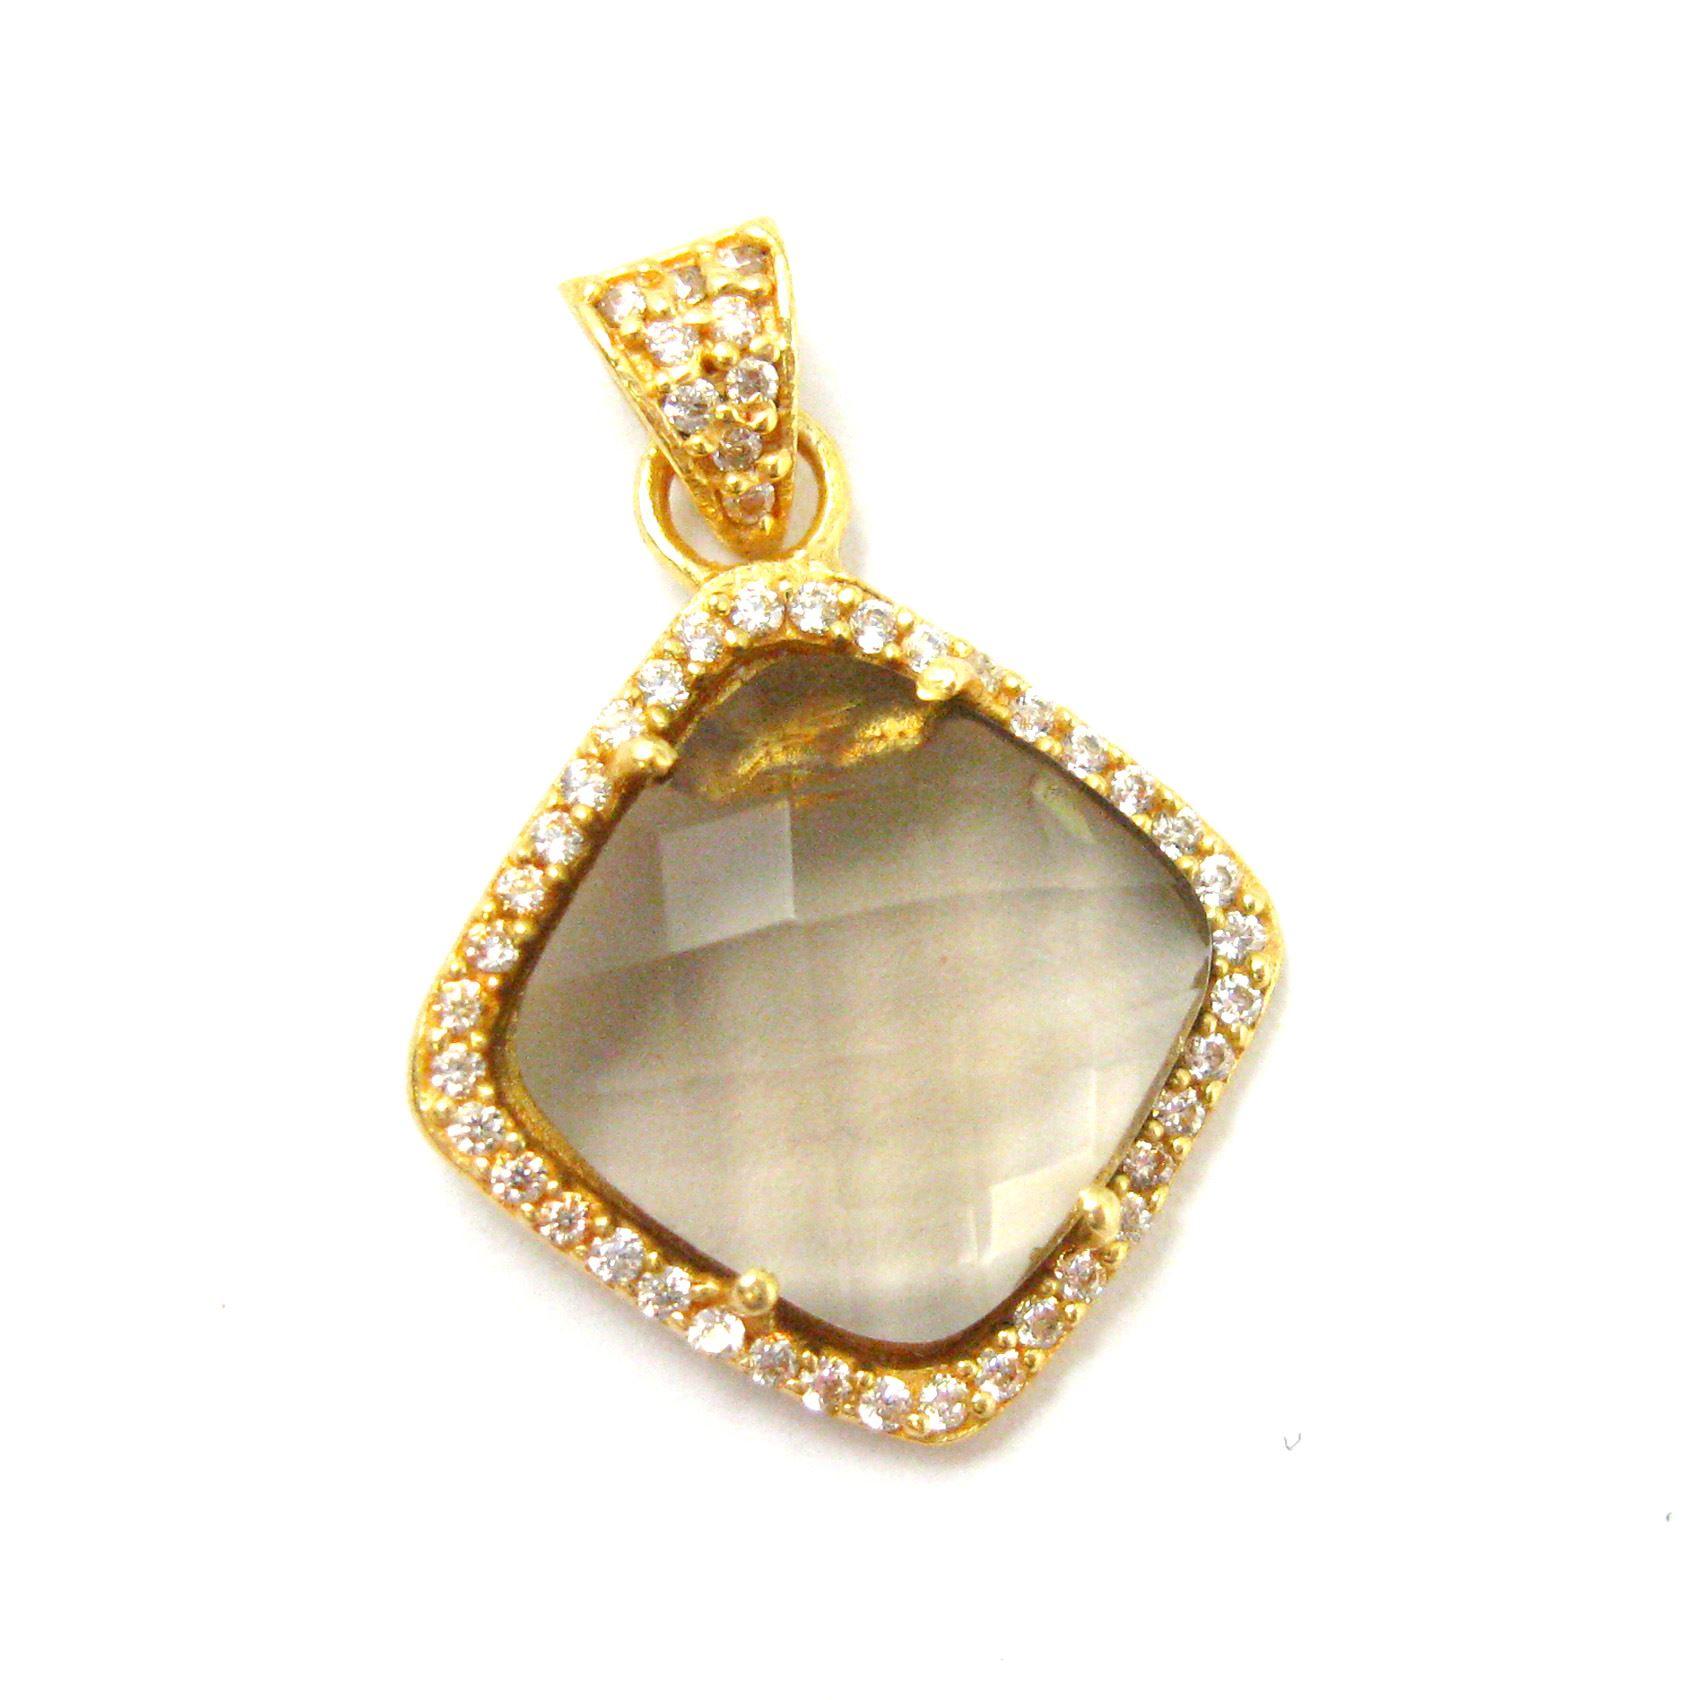 Gold plated Sterling Silver Pave Bezel Gemstone Pendant - Cubic Zirconia Pave Setting -  Diamond Shape Faceted Stone- Smokey Quartz - 17mm